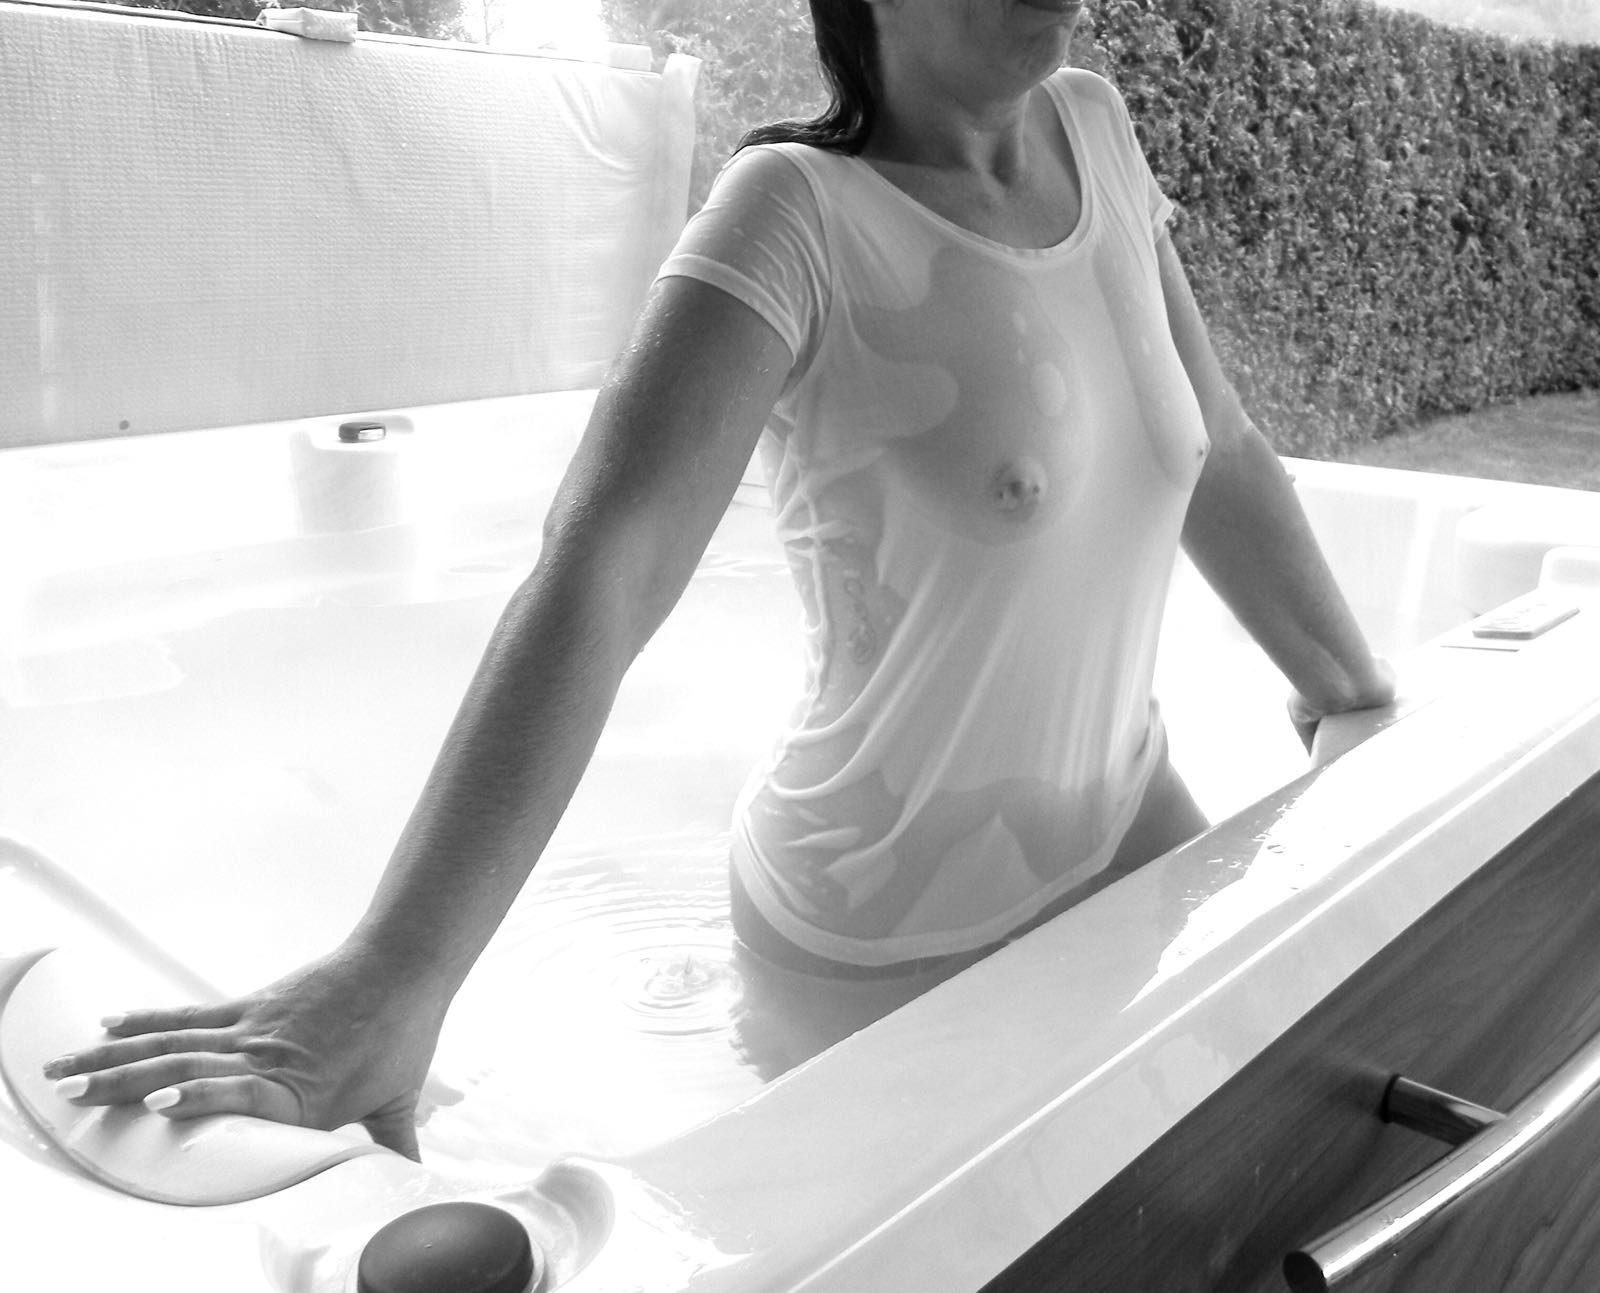 massage nuru blind dating